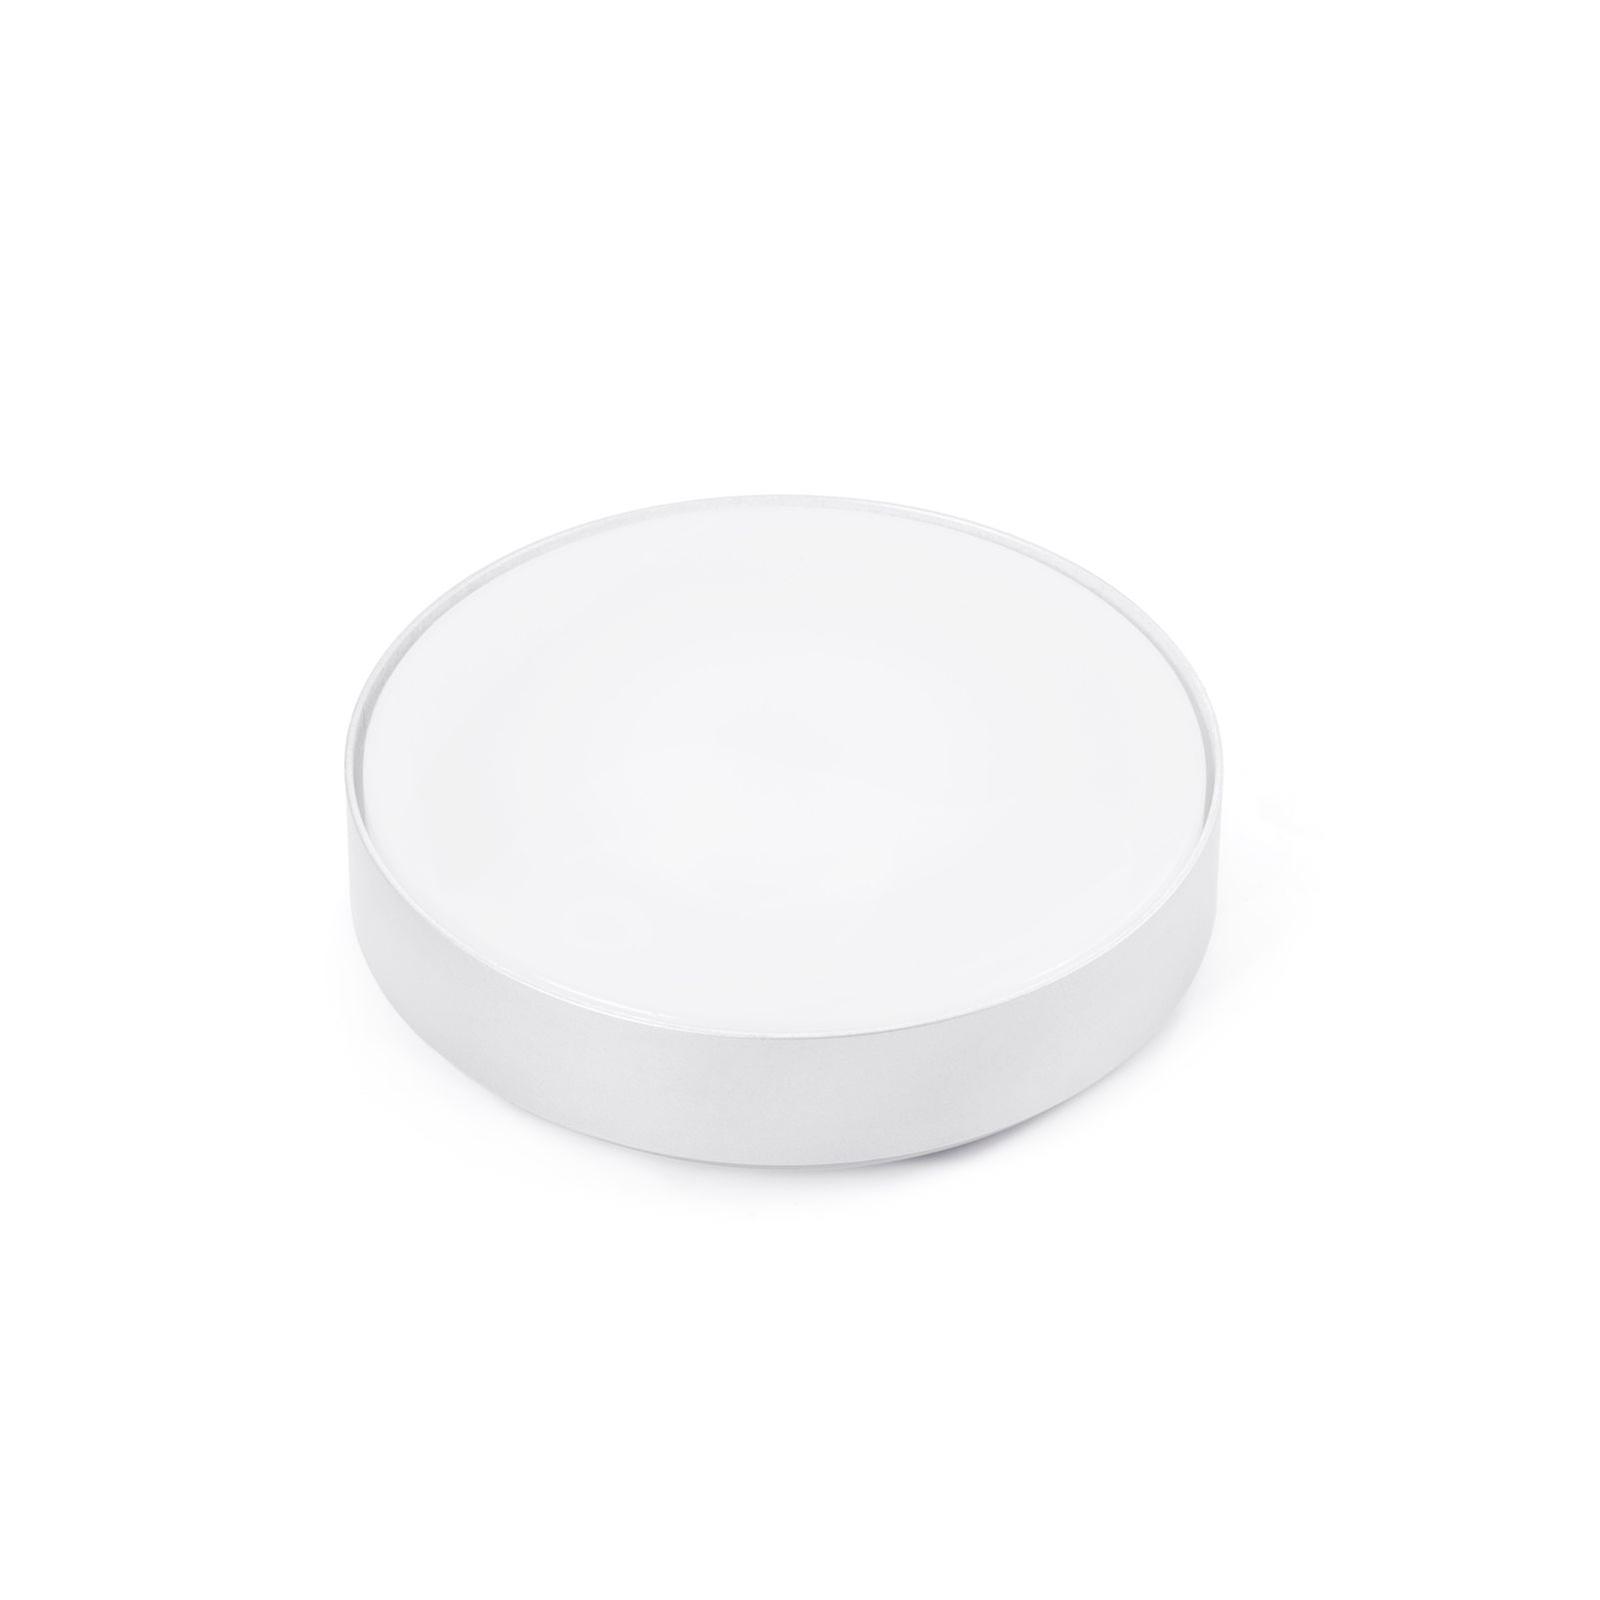 Faro add-on light kit for ceiling fan 33482 Winche chrome